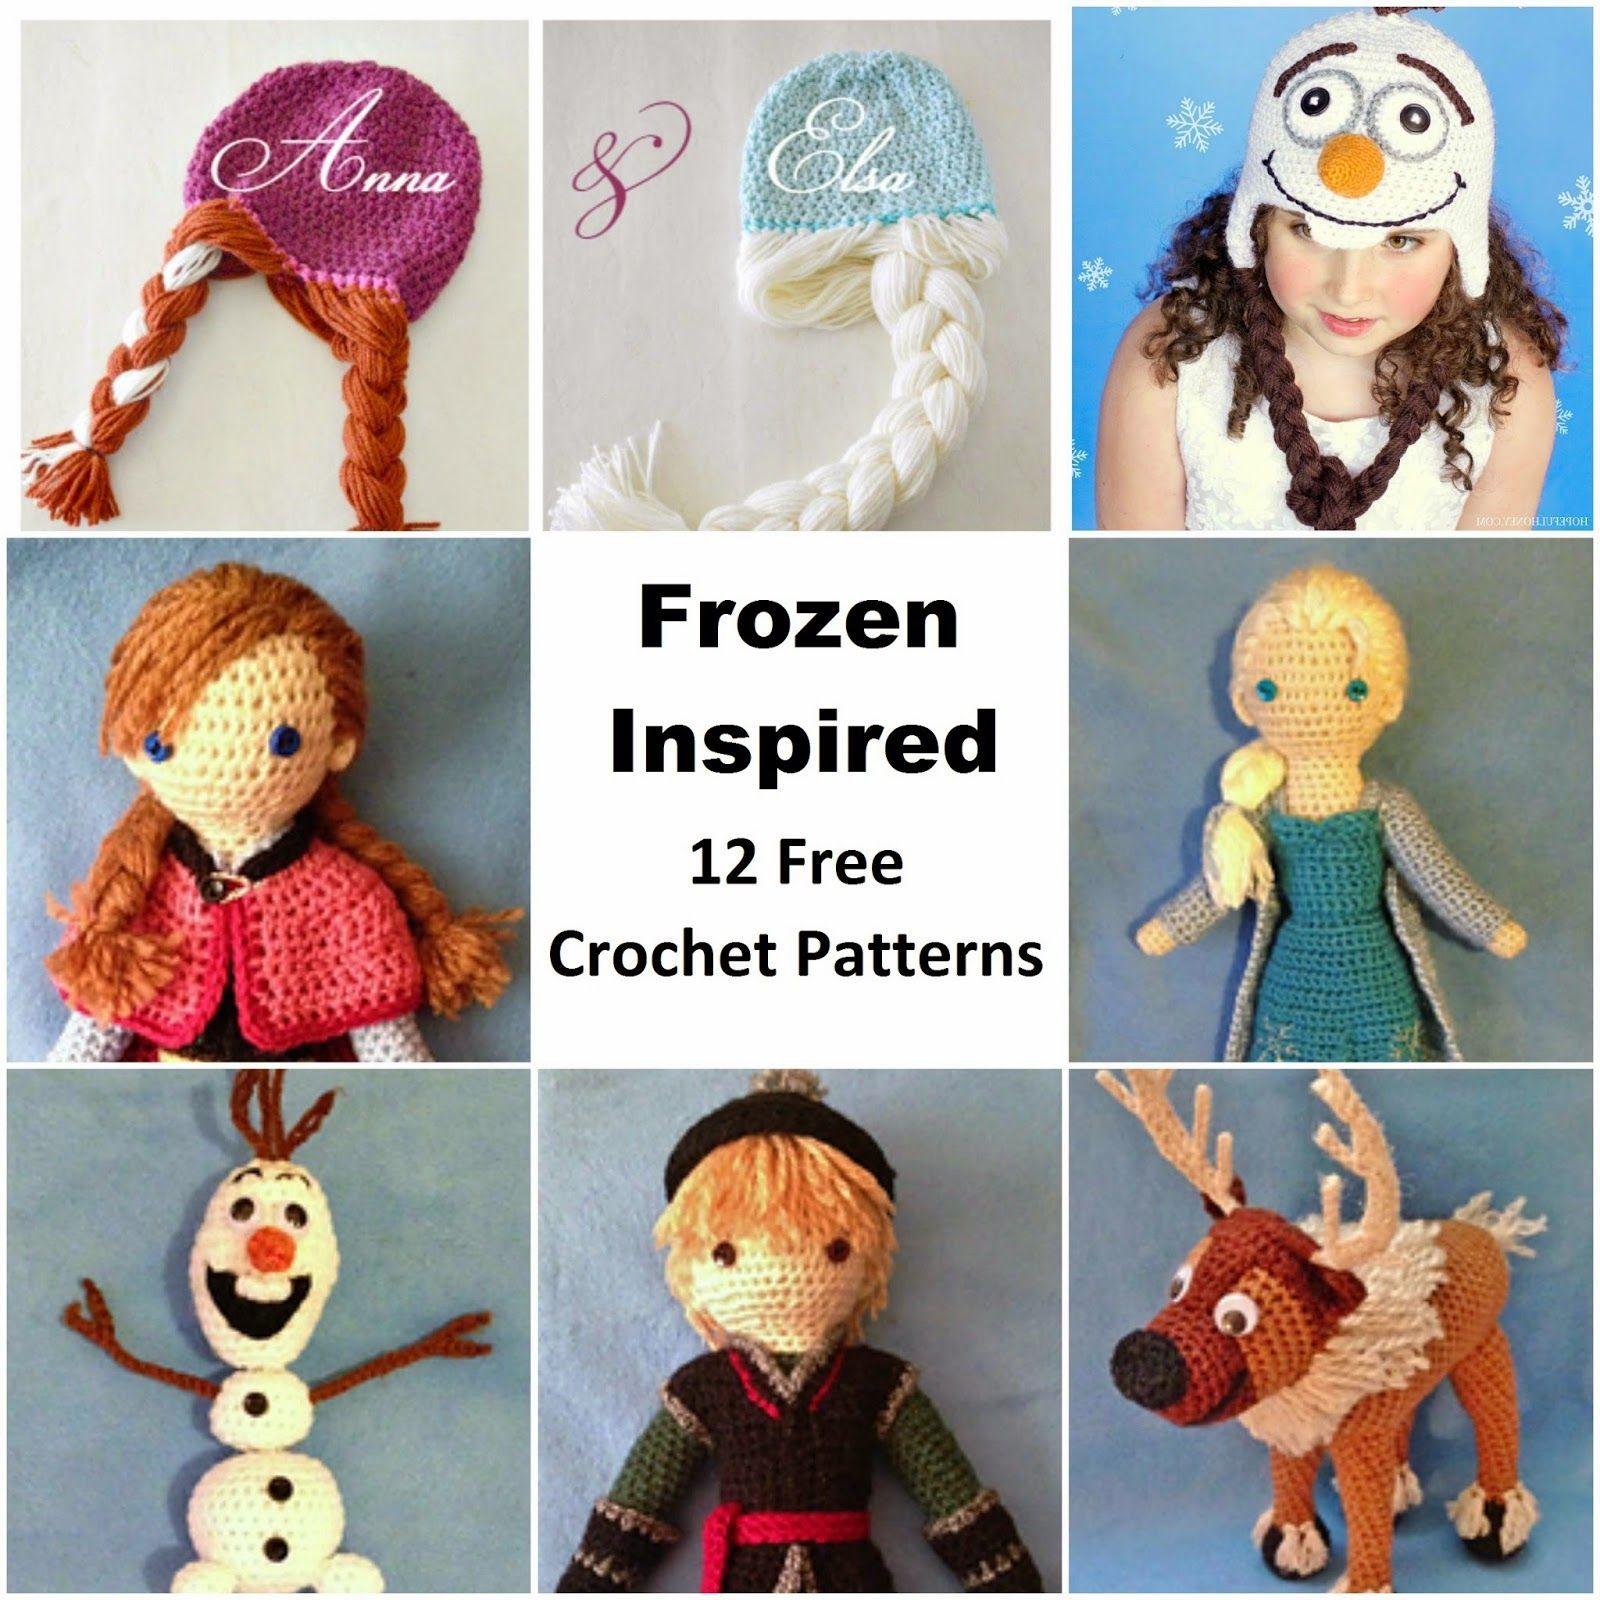 Free Crochet Round-Up: Frozen Inspired - Free Crochet ...